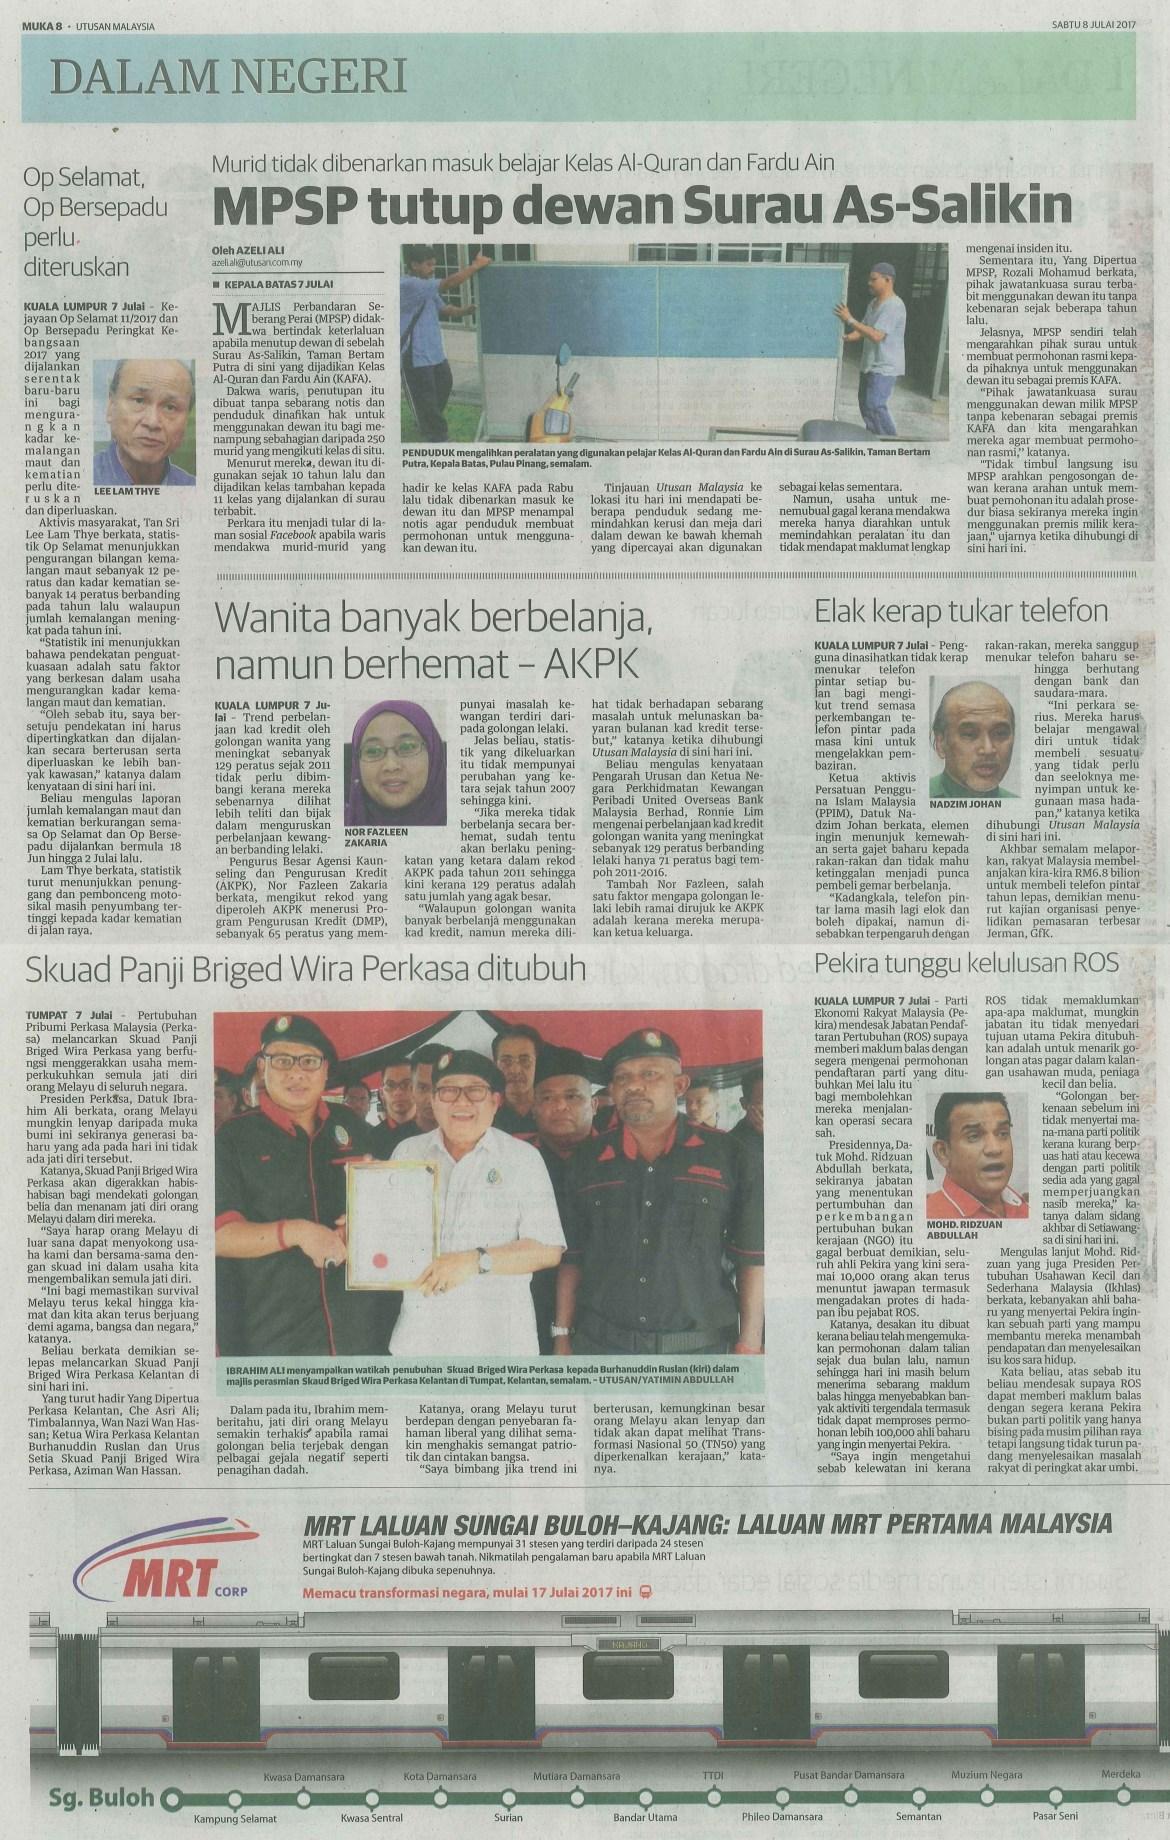 UTUSAN MALAYSIA 8.7.2017